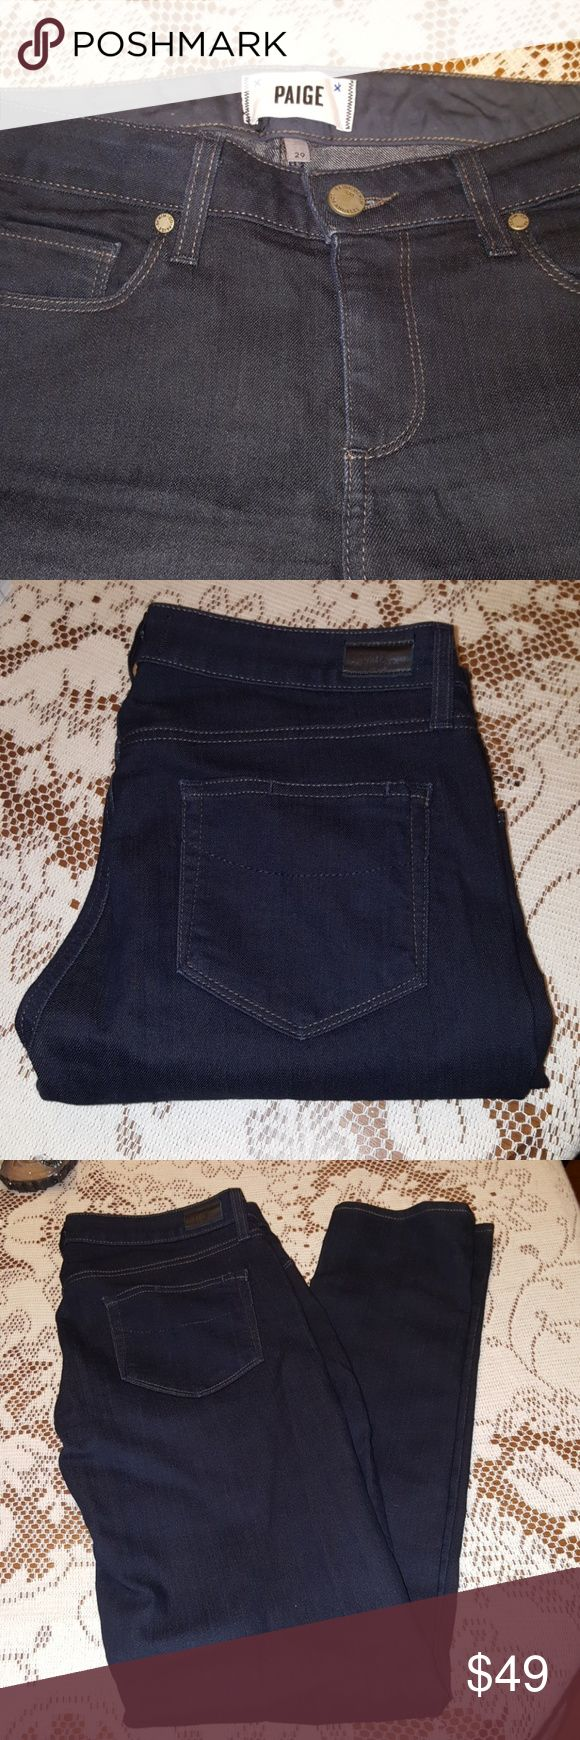 Paige jeans, size 29 Like new, dark denim, skyline skinny style. Awesome jeans. Bundle and save! PAIGE Jeans Skinny